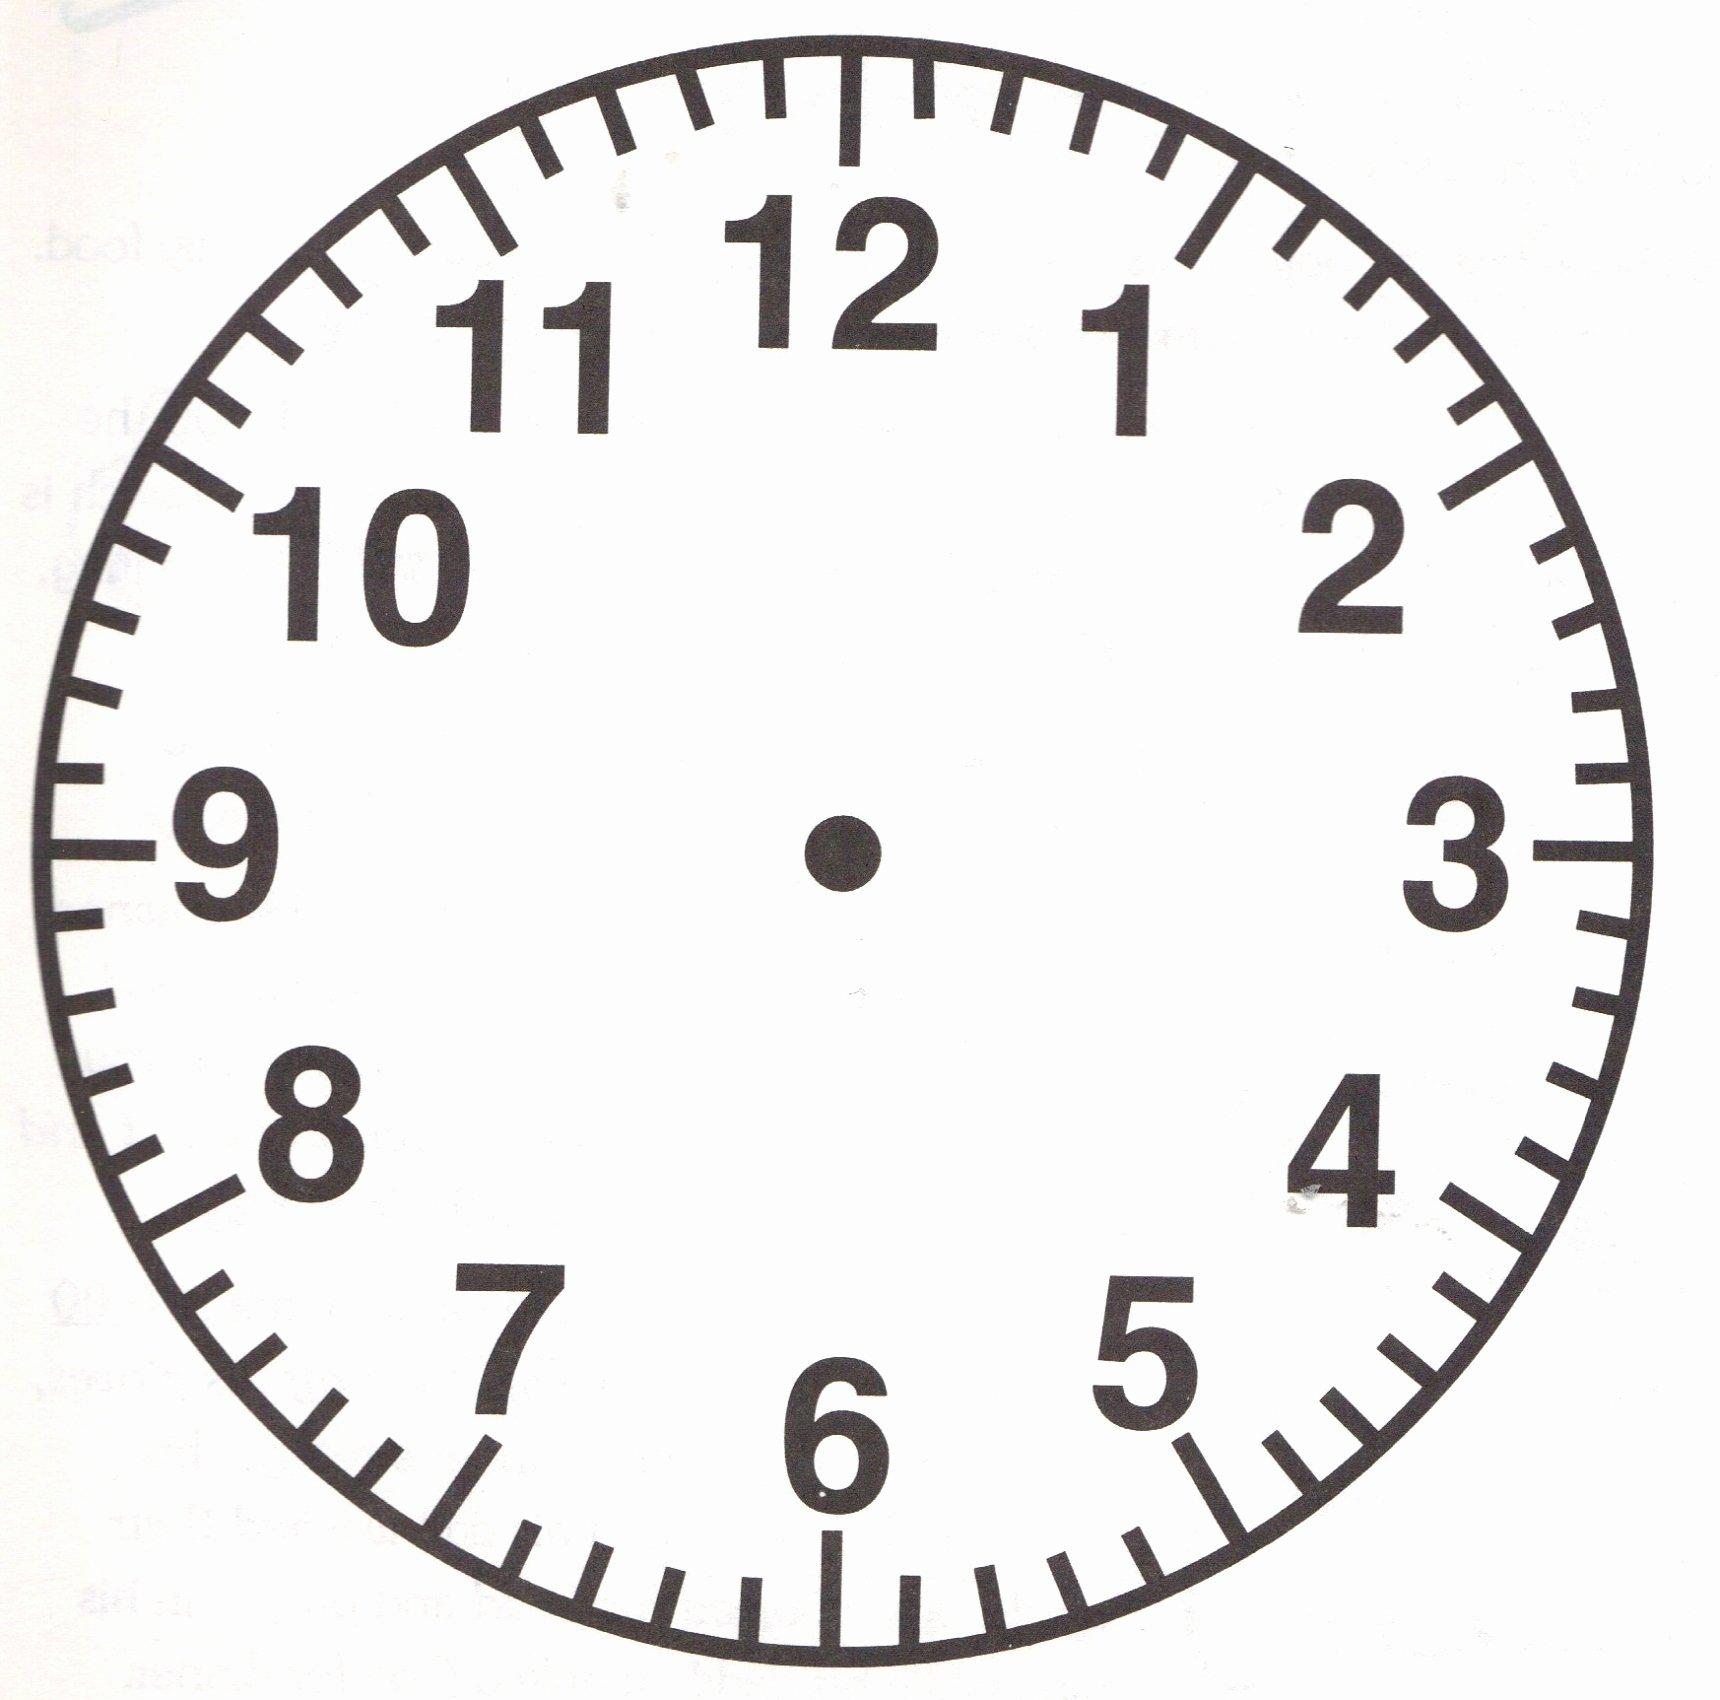 Free Printable Clock Template Luxury Blank Clock Faces Printable